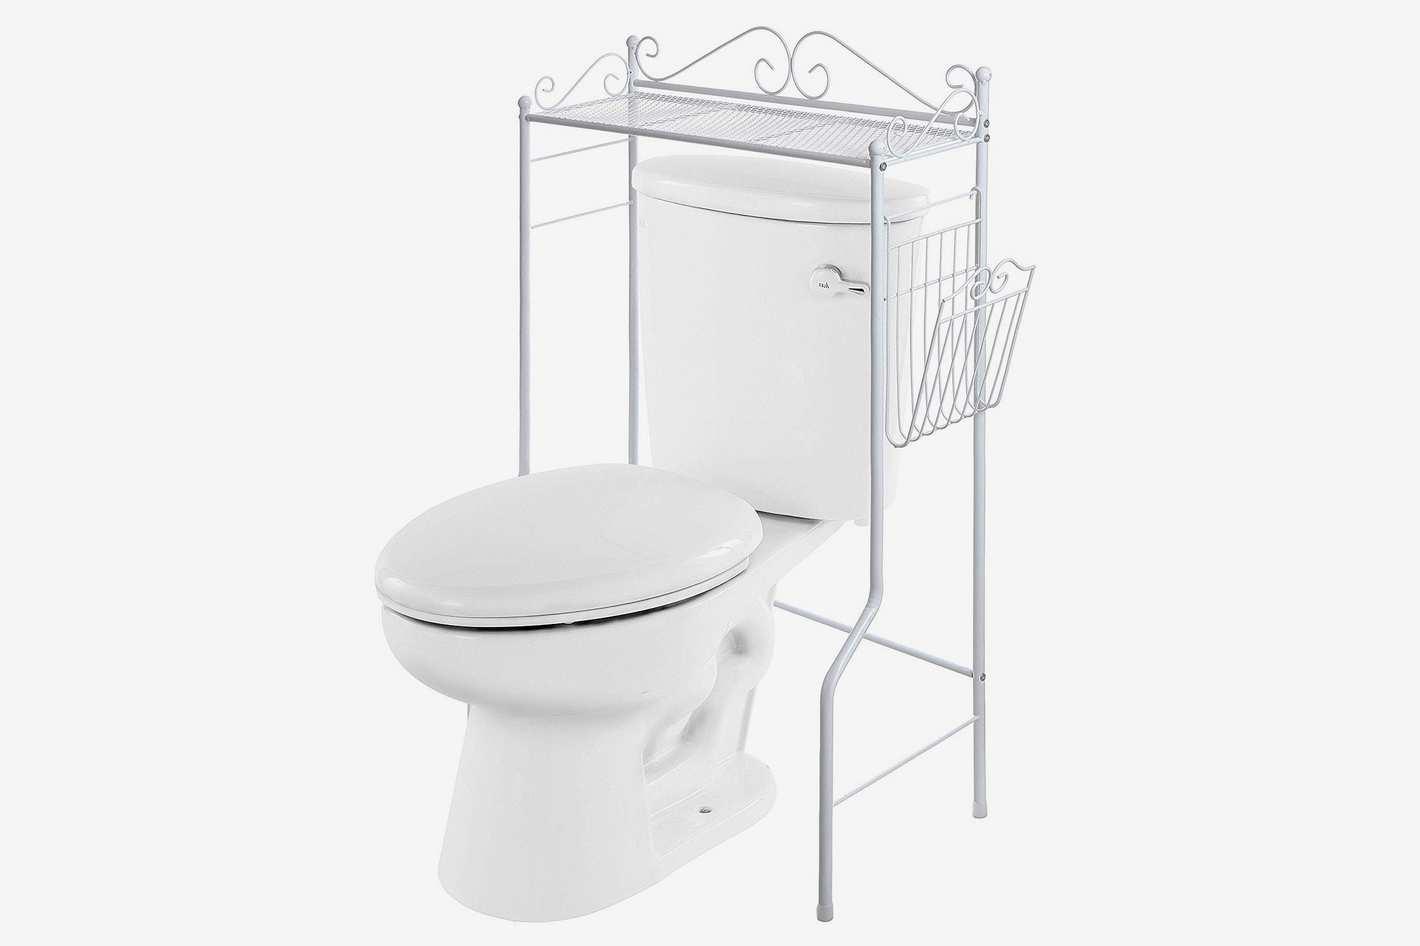 Space Saver Design Metal Storage Organizer Rack/Freestanding Bathroom Shelf With Magazine Basket